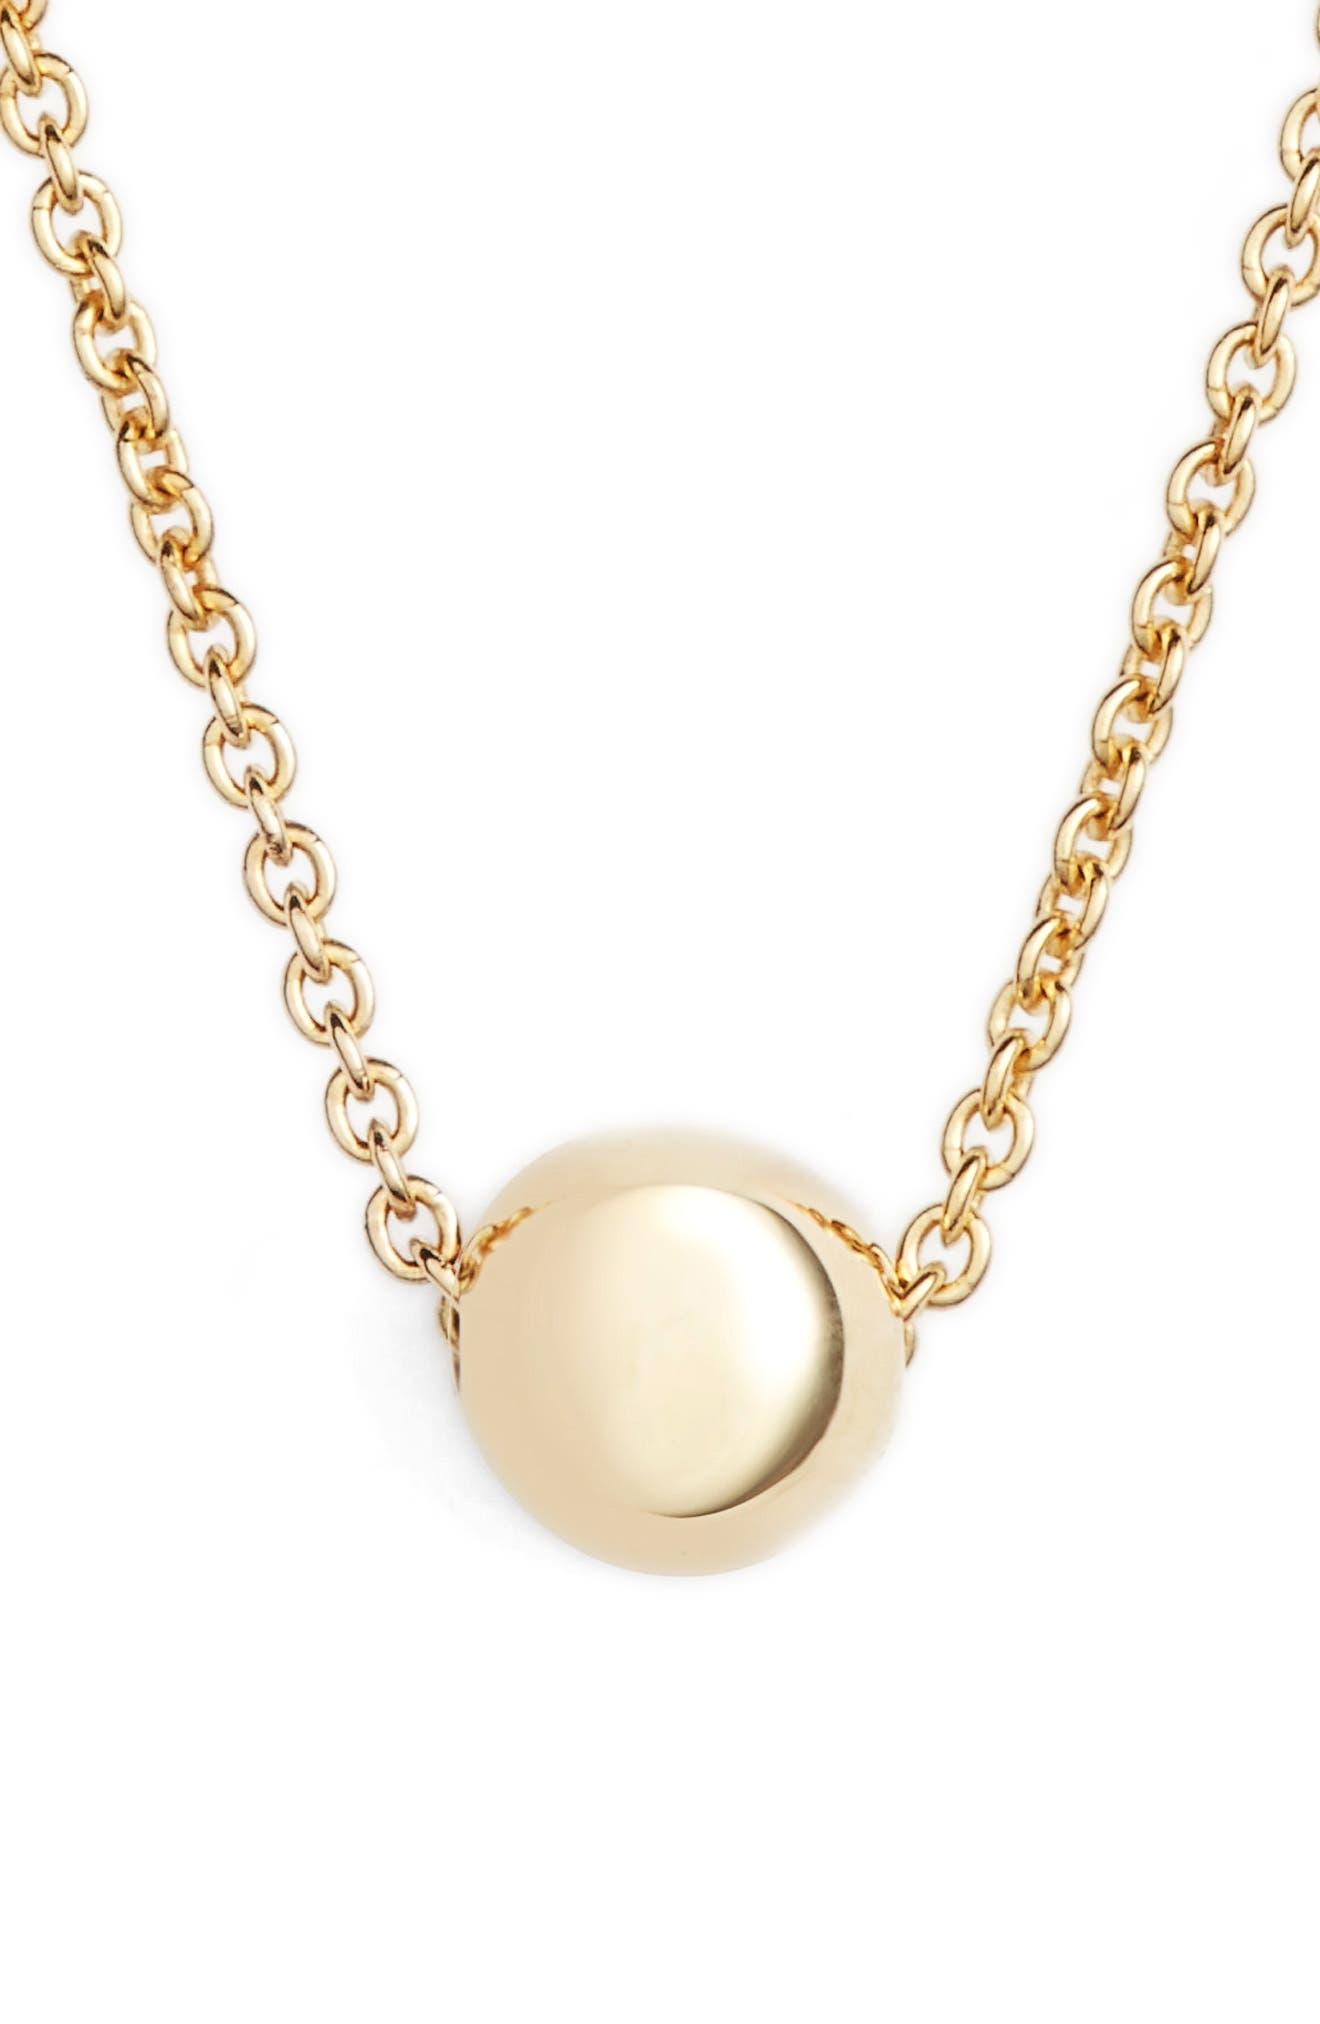 Ball Pendant Necklace,                             Main thumbnail 1, color,                             YELLOW GOLD